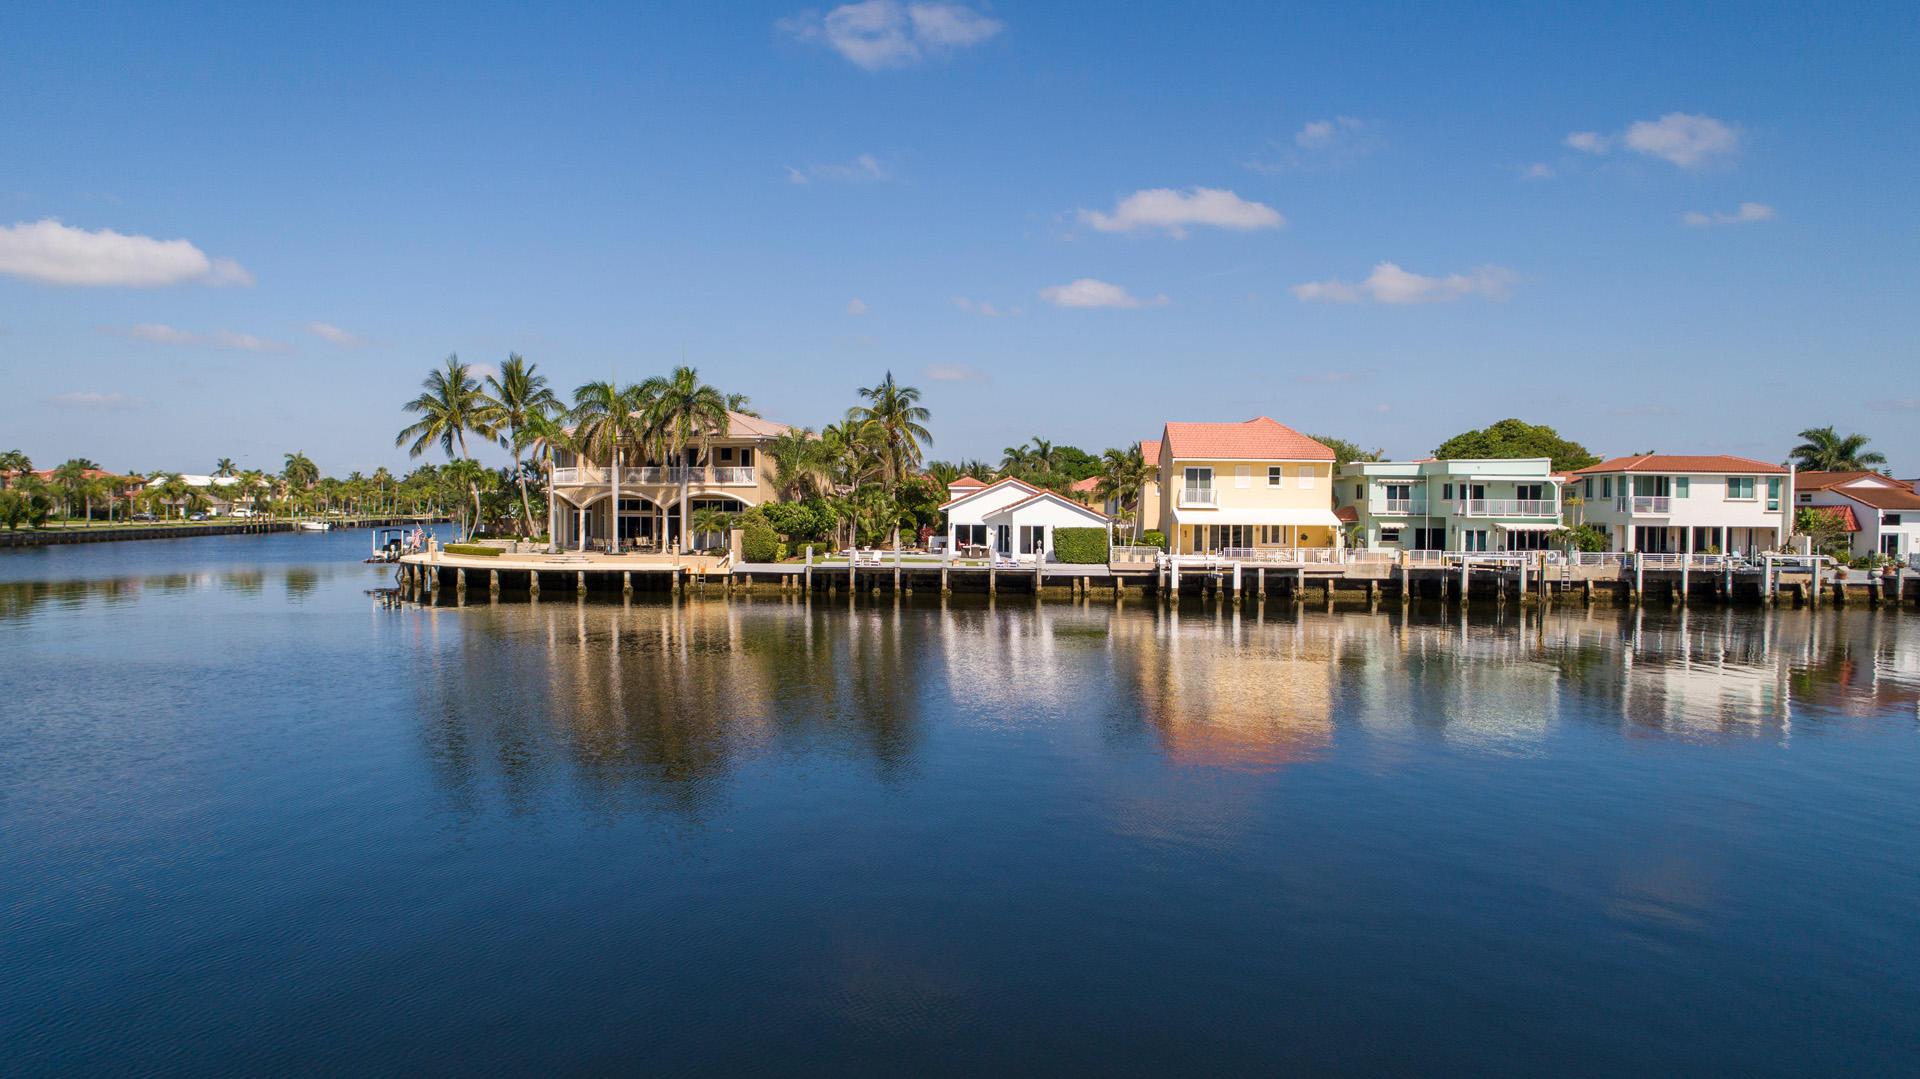 3599 Admirals Way, Delray Beach, Florida 33483, 2 Bedrooms Bedrooms, ,2 BathroomsBathrooms,Single Family Detached,For Sale,Admirals,RX-10532011